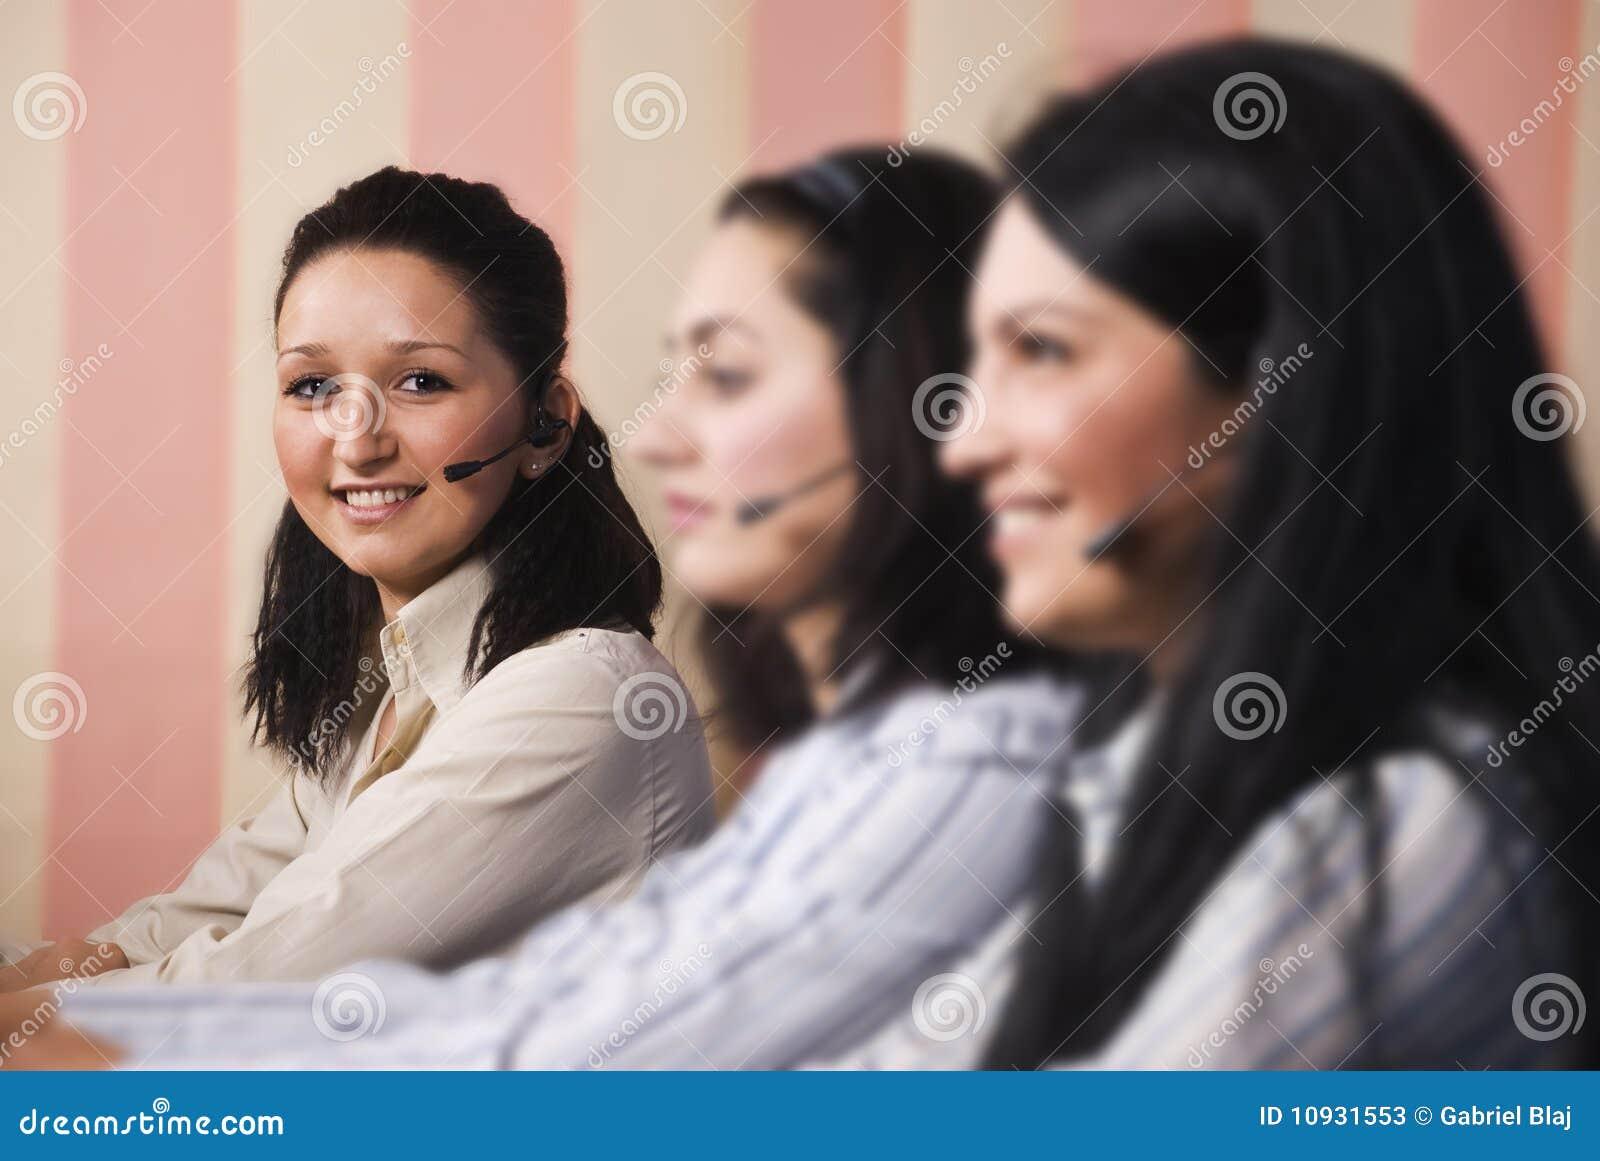 Customer service team women